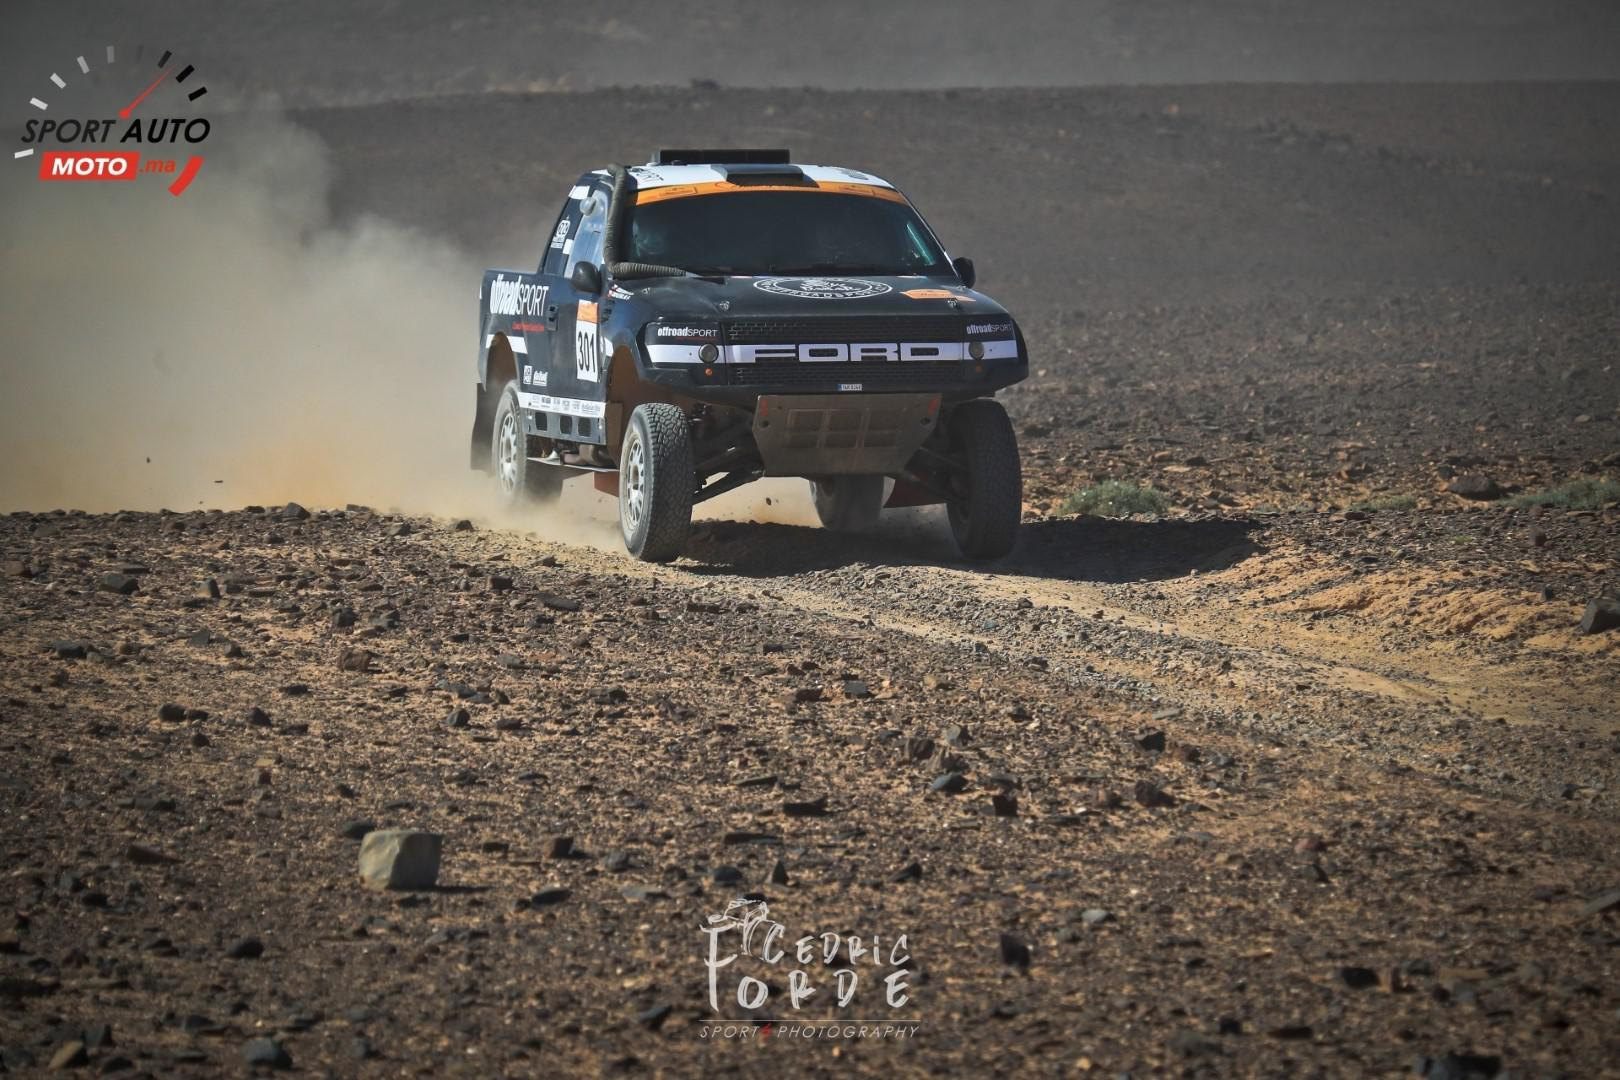 Hearts of Morocco 2018 : Zapletal et Pedrero remporte le rallye